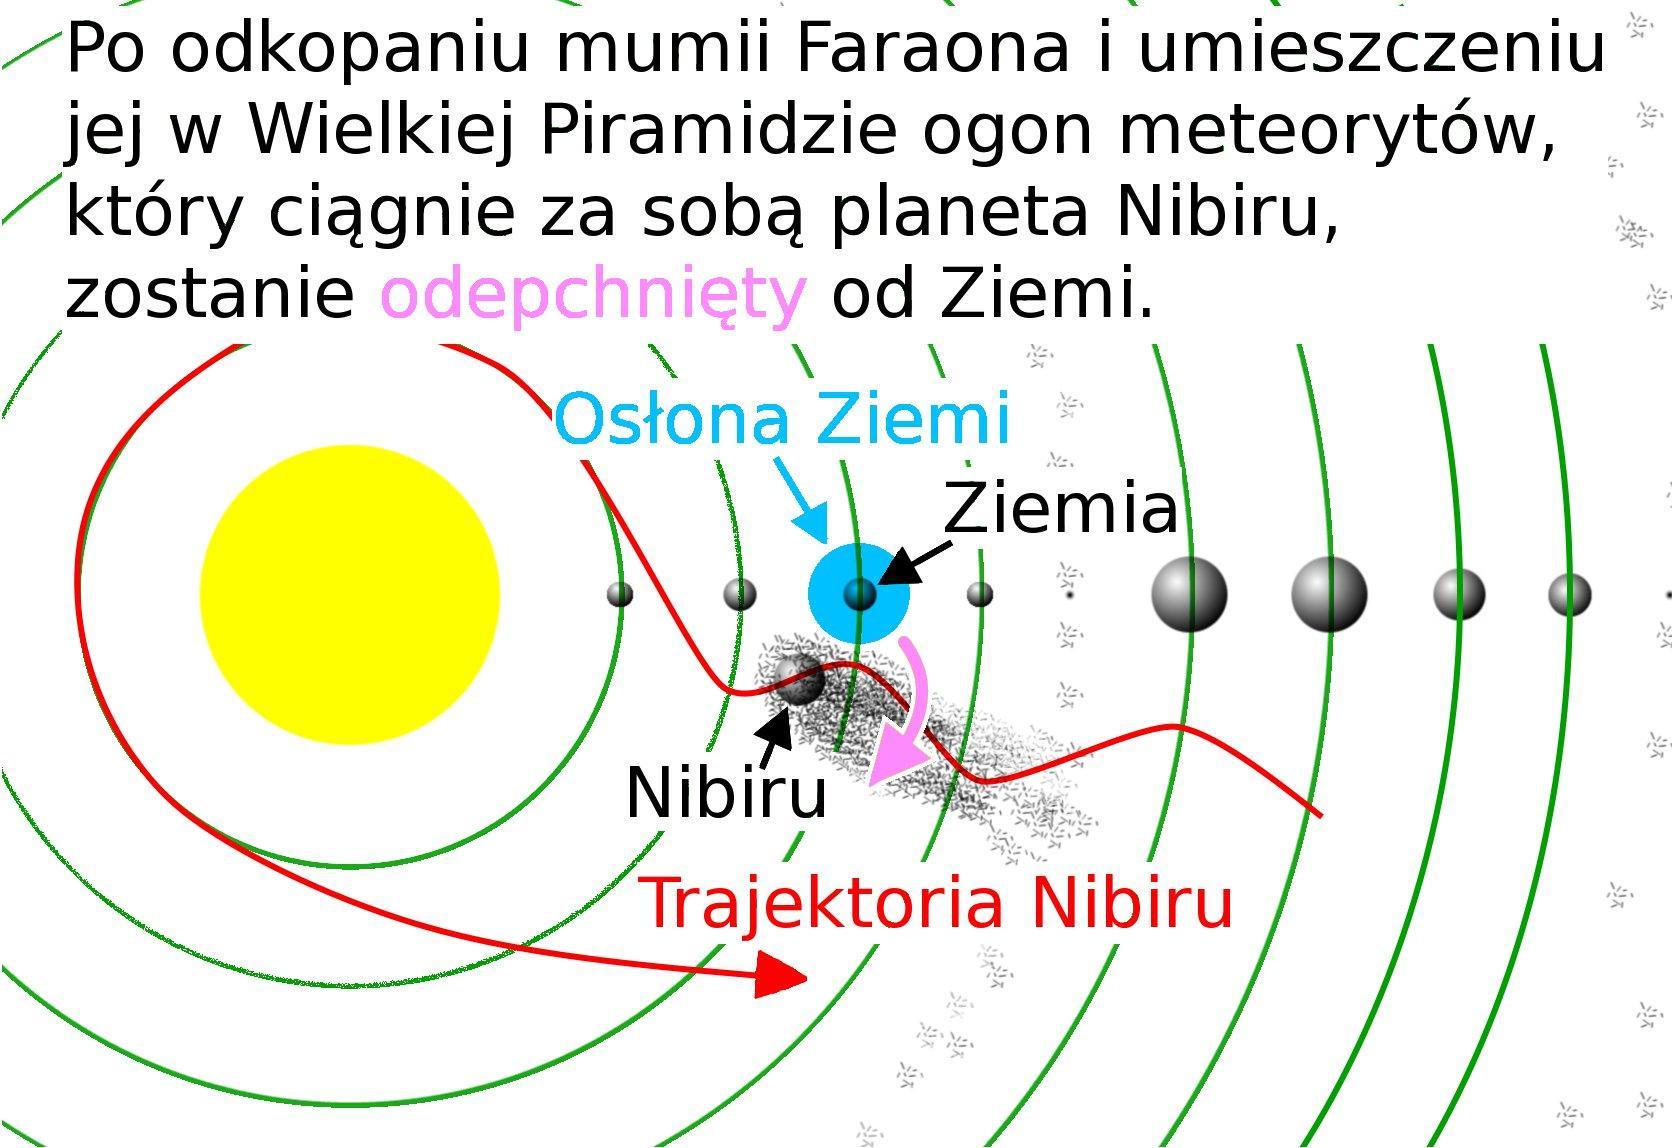 Trajektoria Nibiru 2